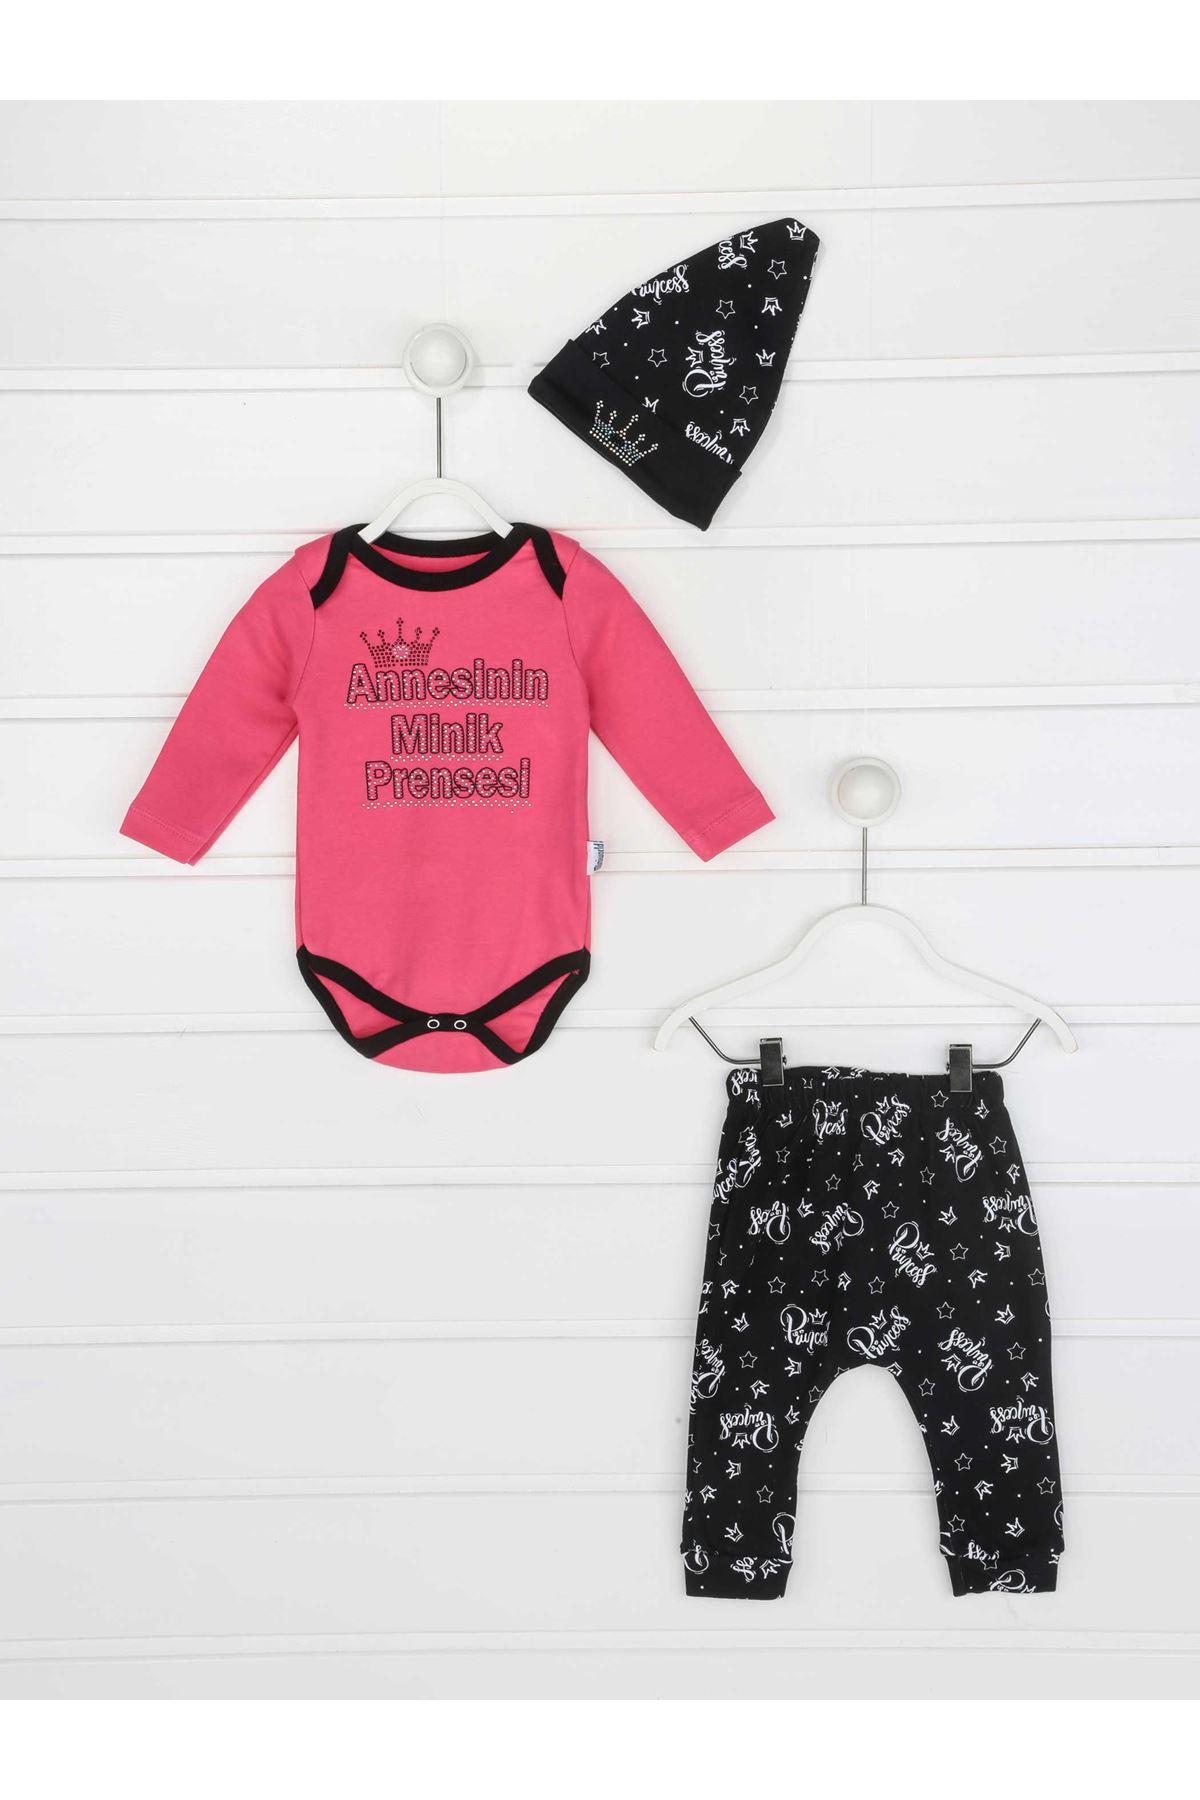 Fuchsia Mother Tiny Princess Baby Girl 3 Pcs Set